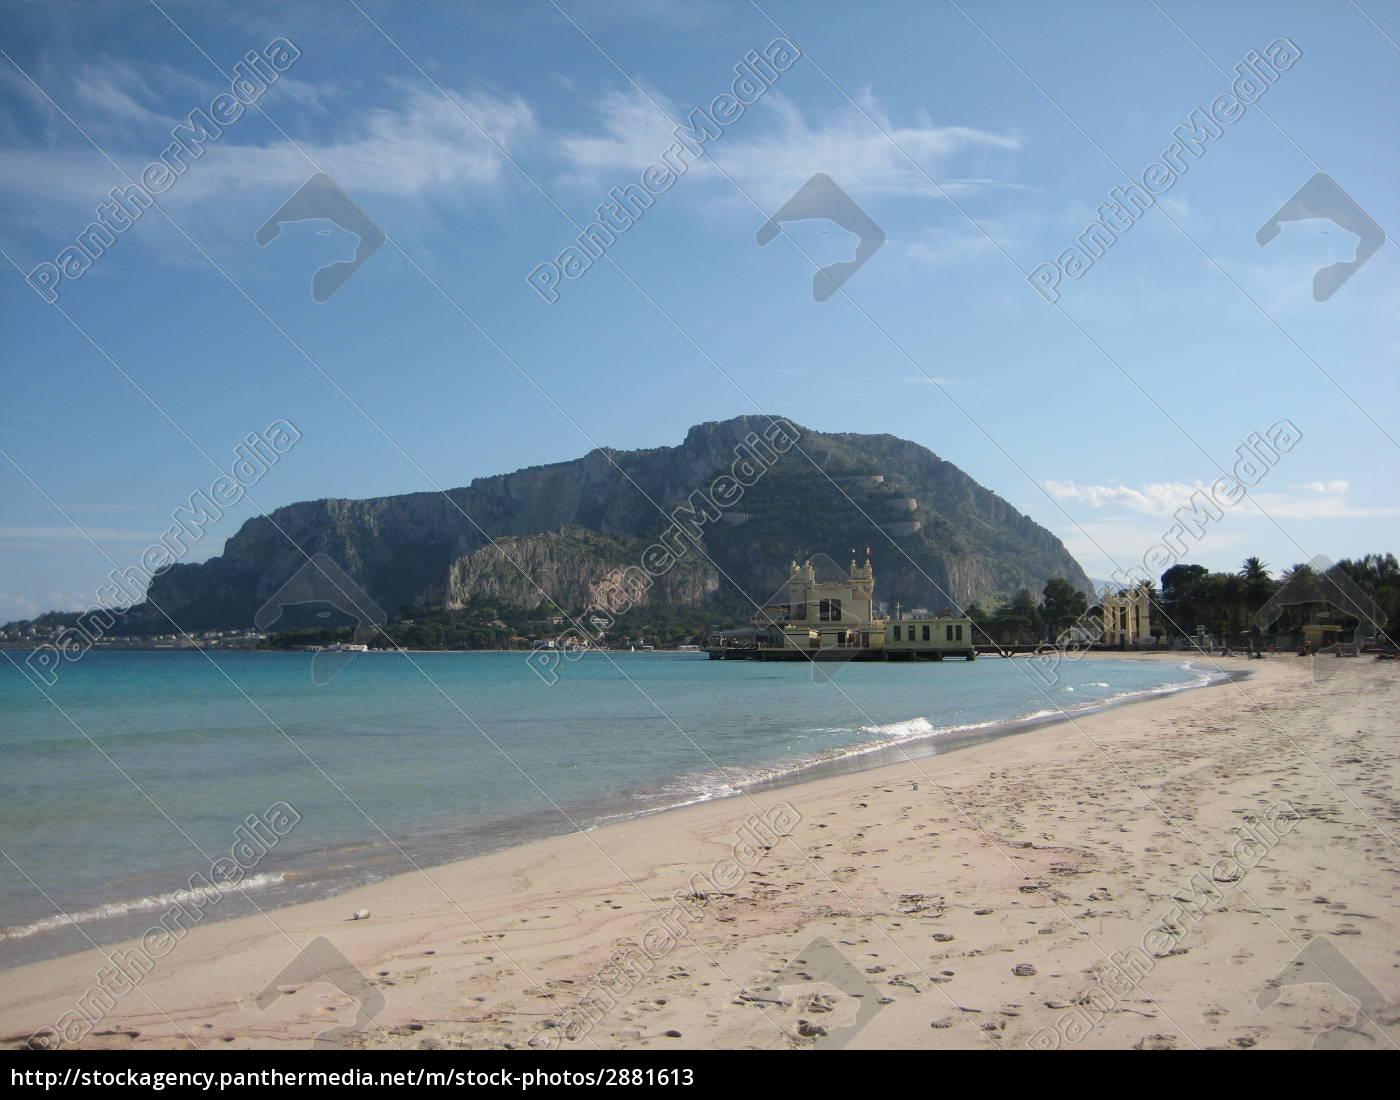 mondello, beach, on, sicily - 2881613